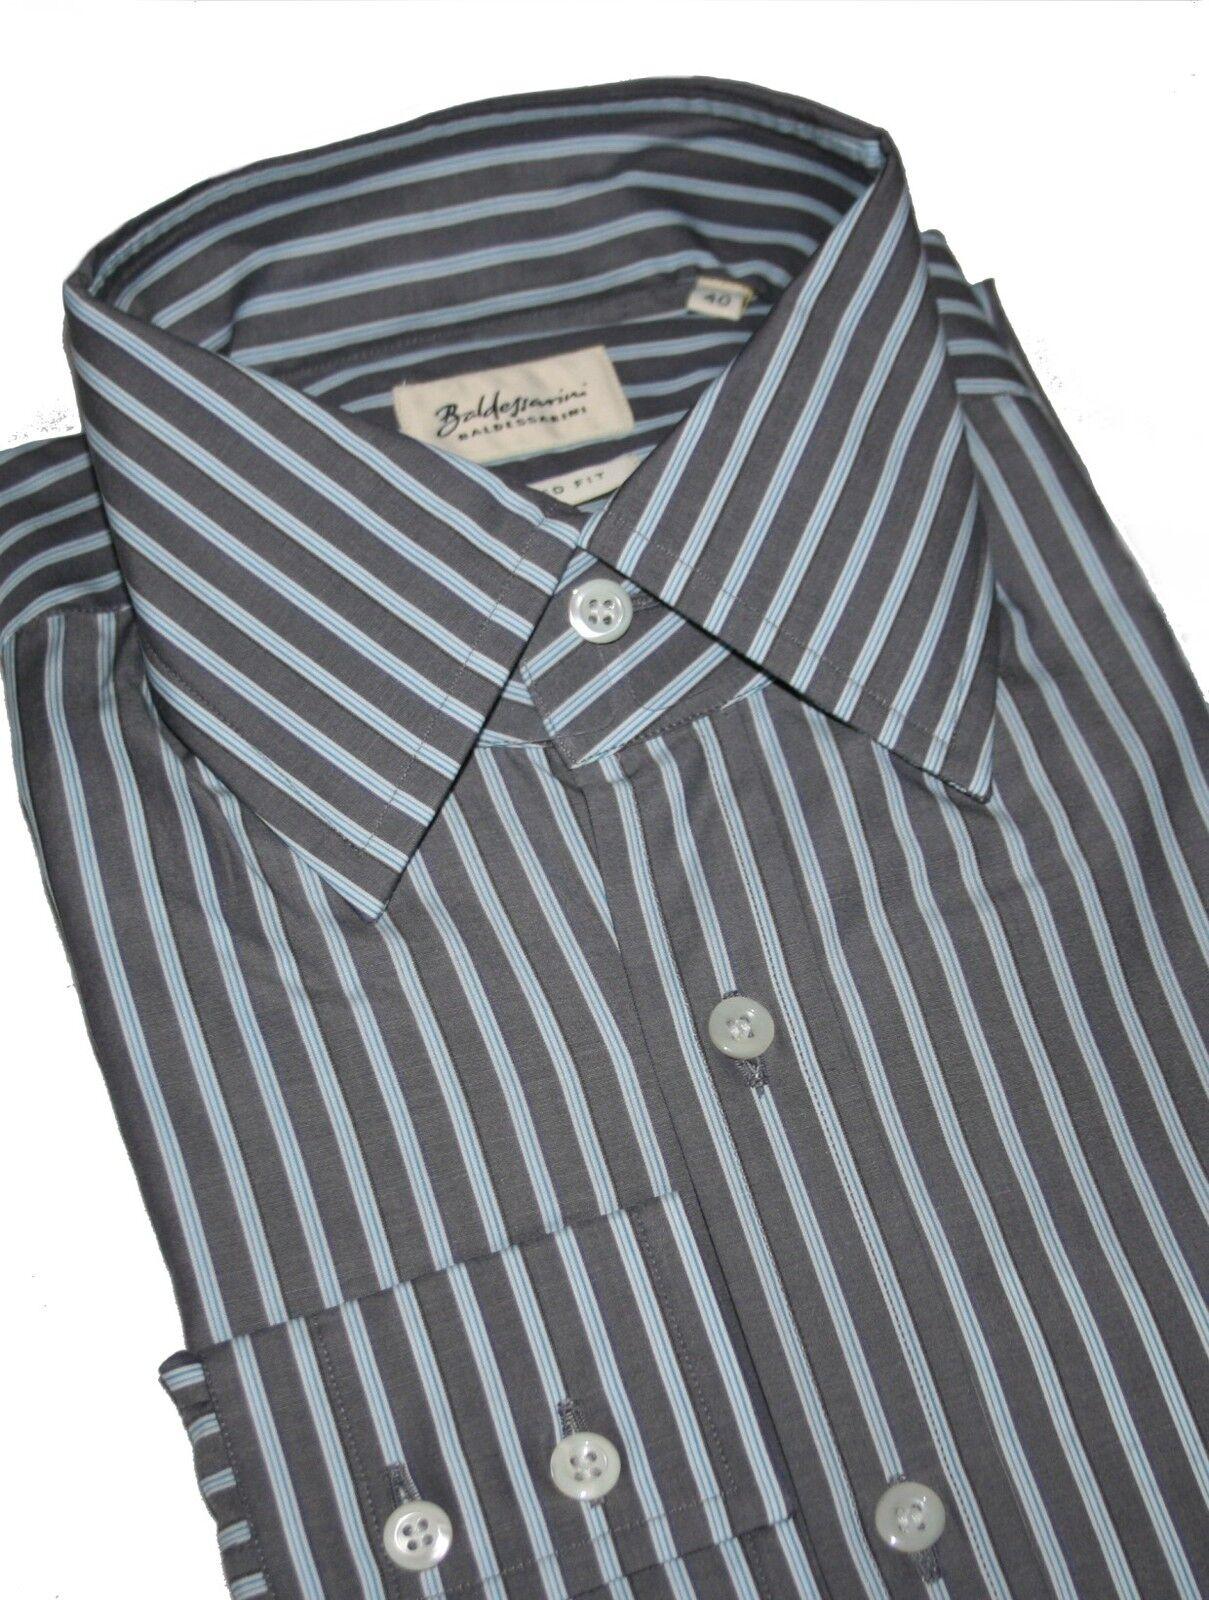 Baldessarini Signature Camicia 26 shaped Fit Camicia kw.40 & 41